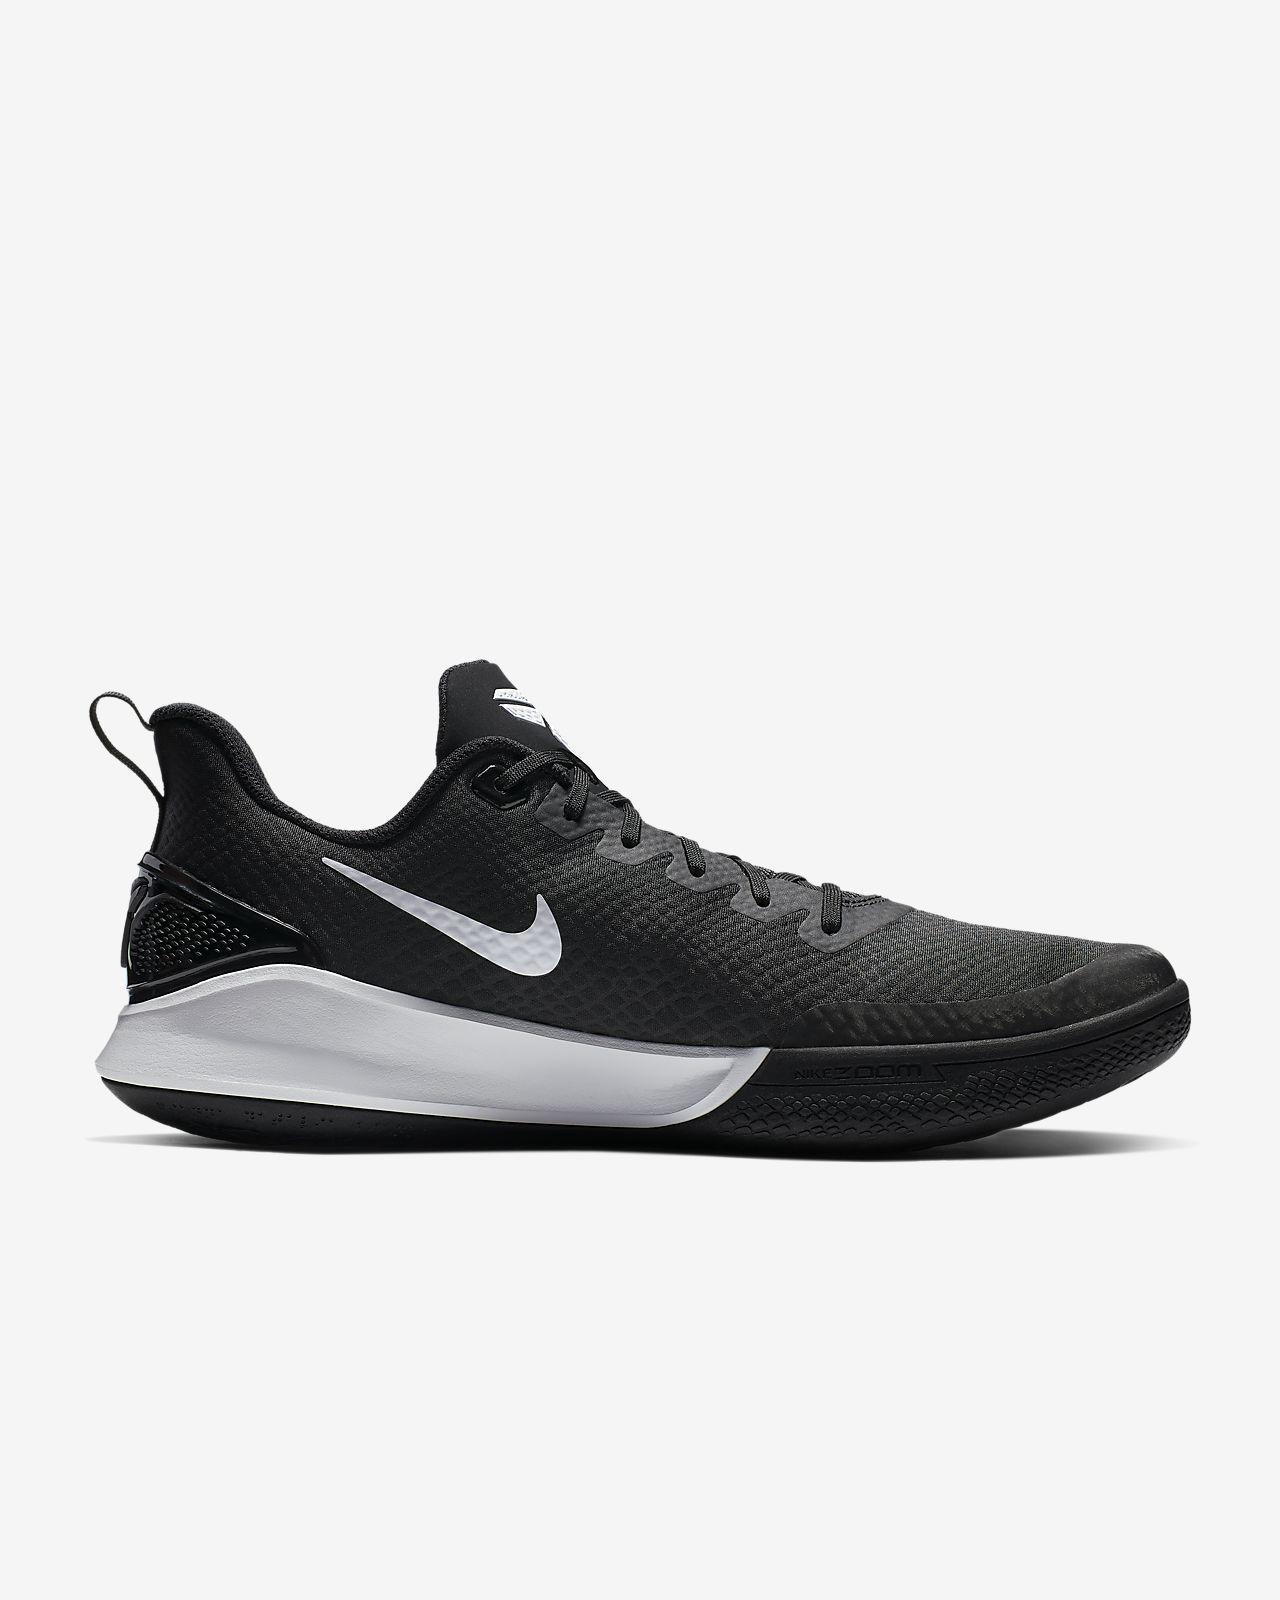 73088d38 Low Resolution Mamba Focus Basketball Shoe Mamba Focus Basketball Shoe